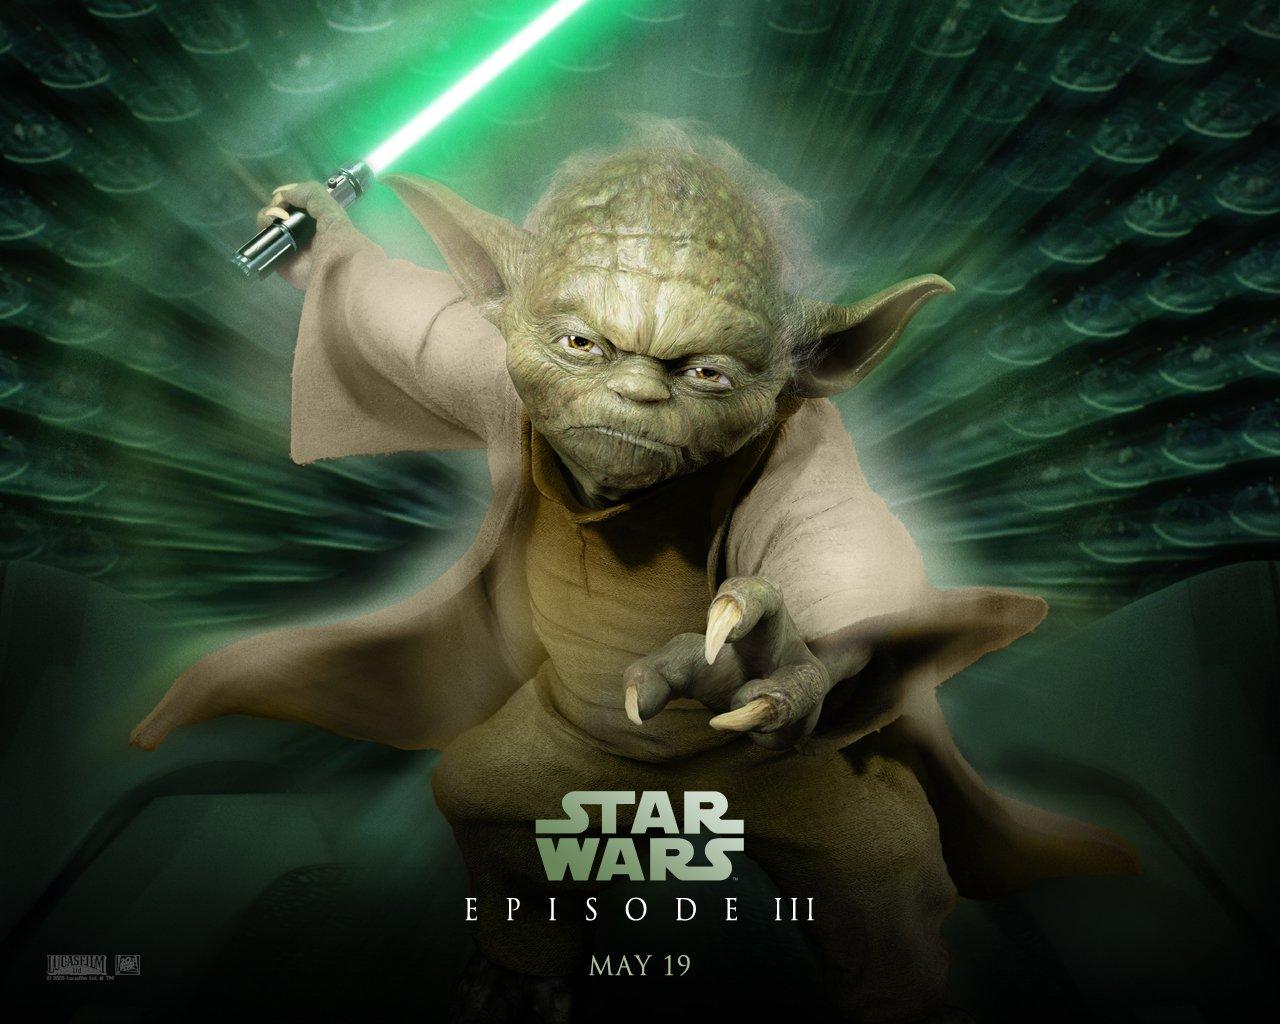 Star Wars Episode 3 Desktop Wallpapers FREE on Latoro.com